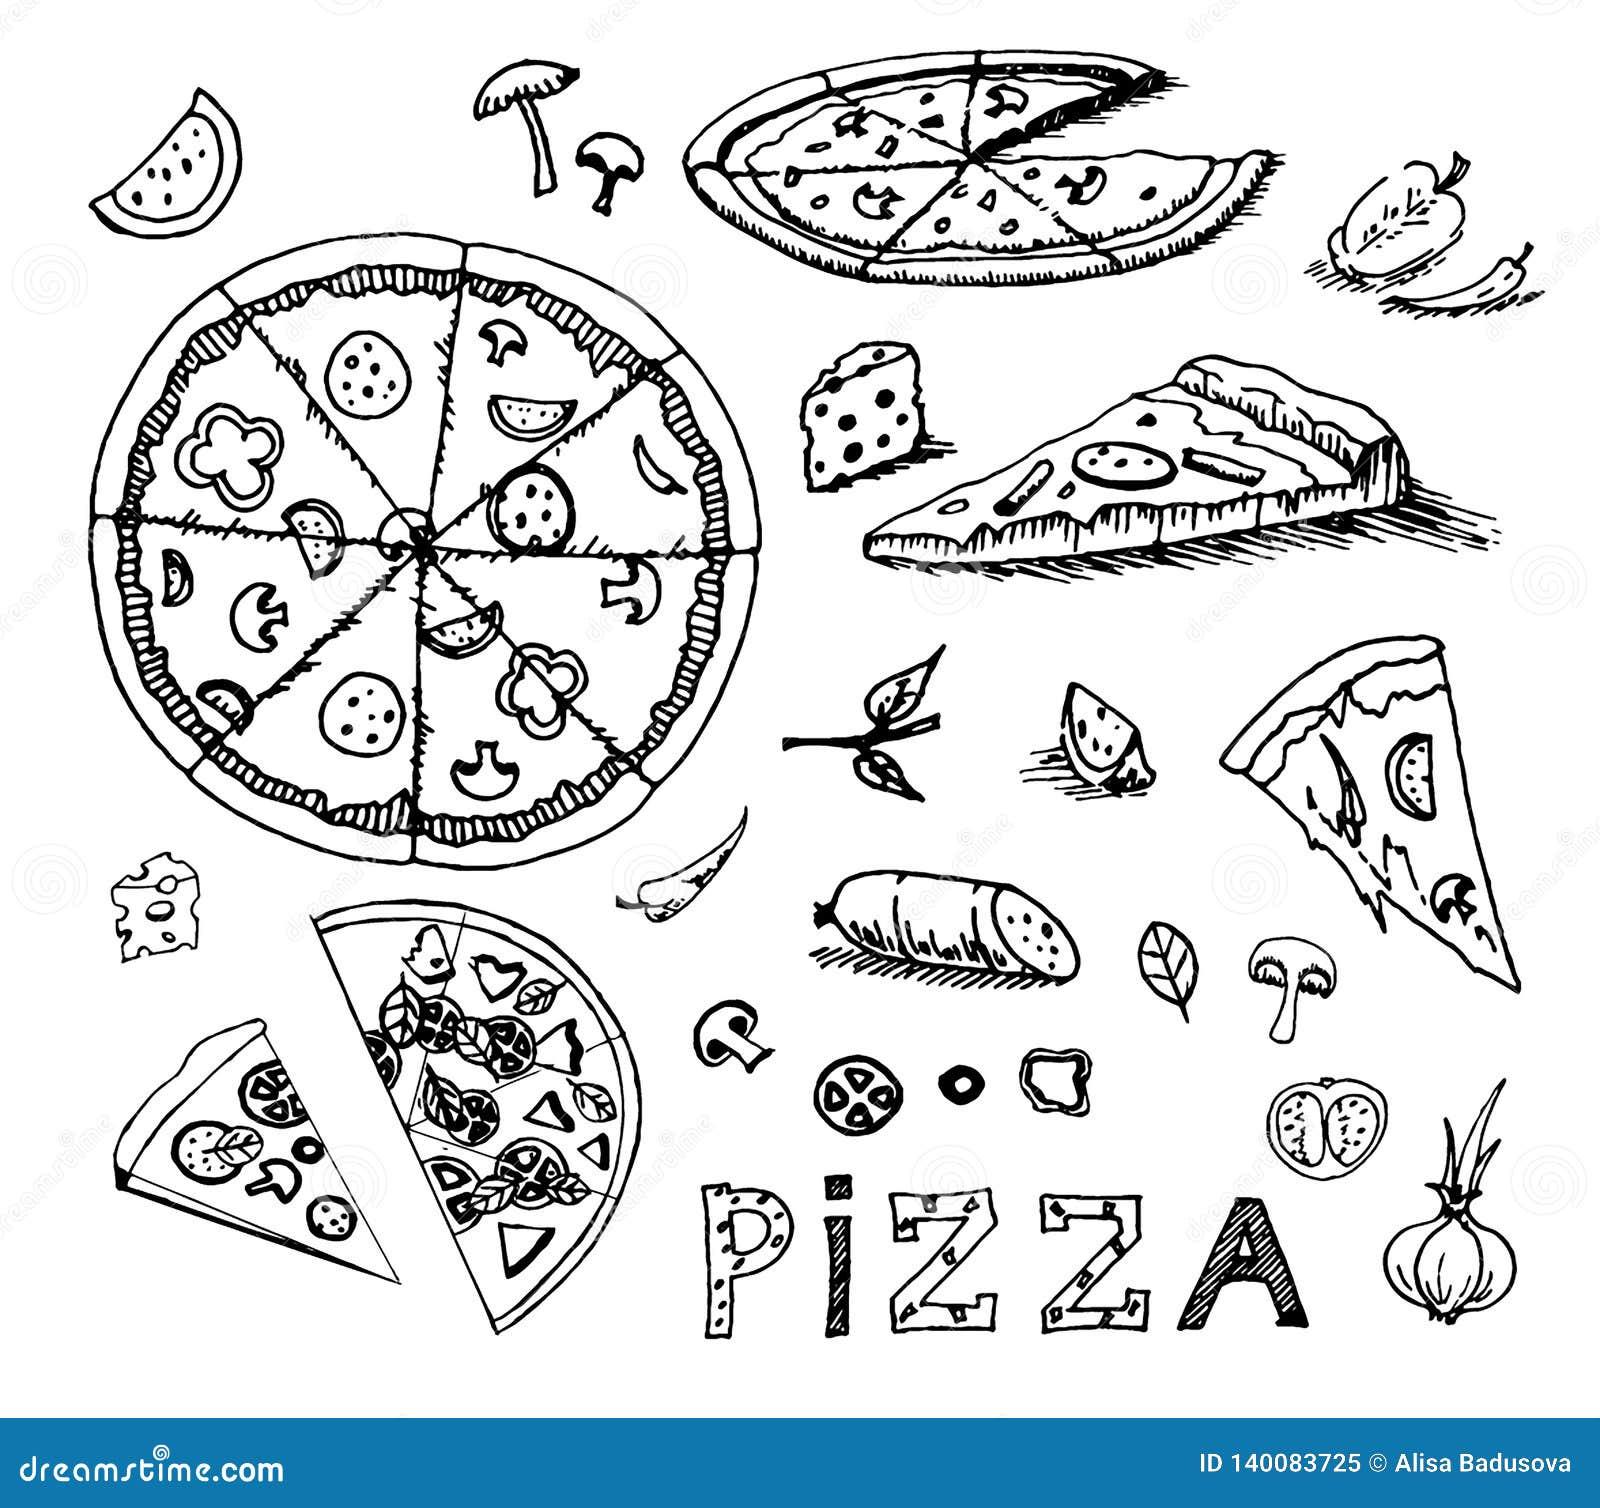 Den drog vektorhanden skissar av pizzaillustration på vit bakgrund